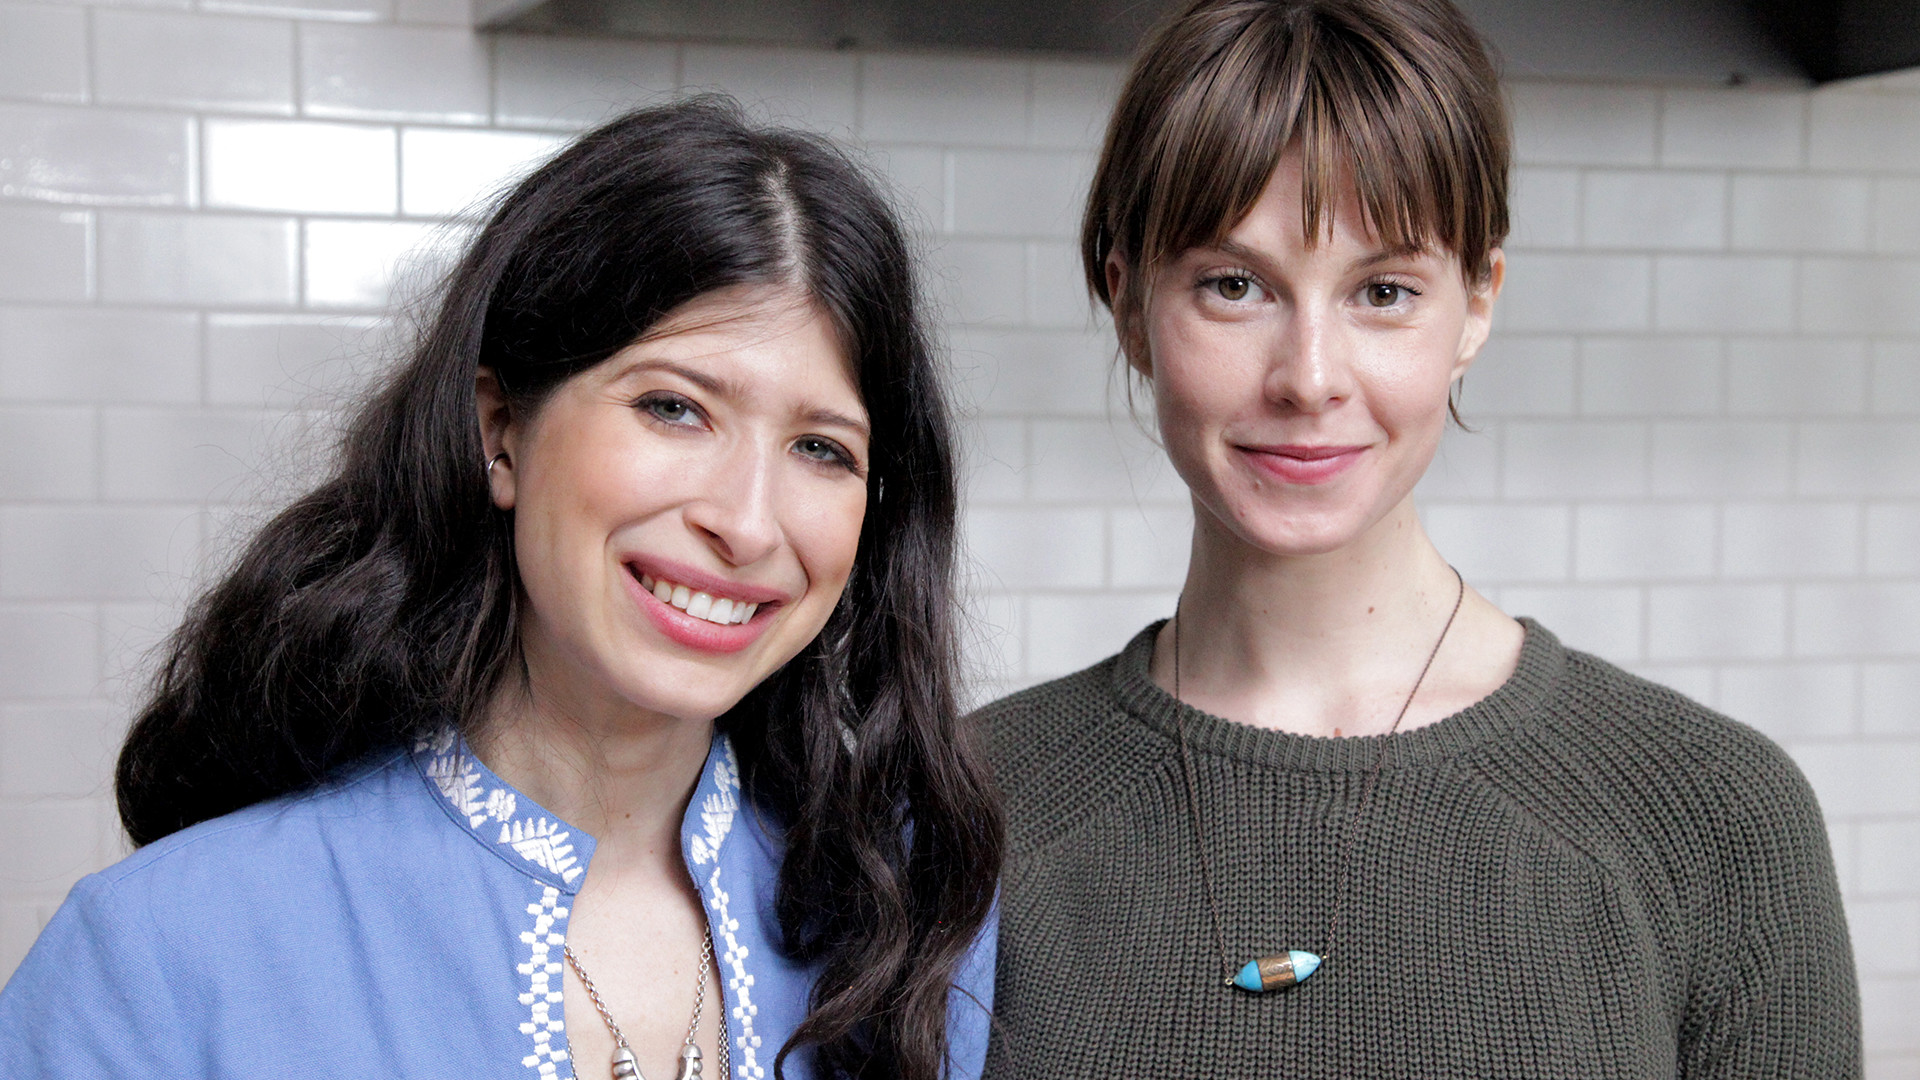 Elettra's Goodness - Pamela Love's Vegan Chili Recipe